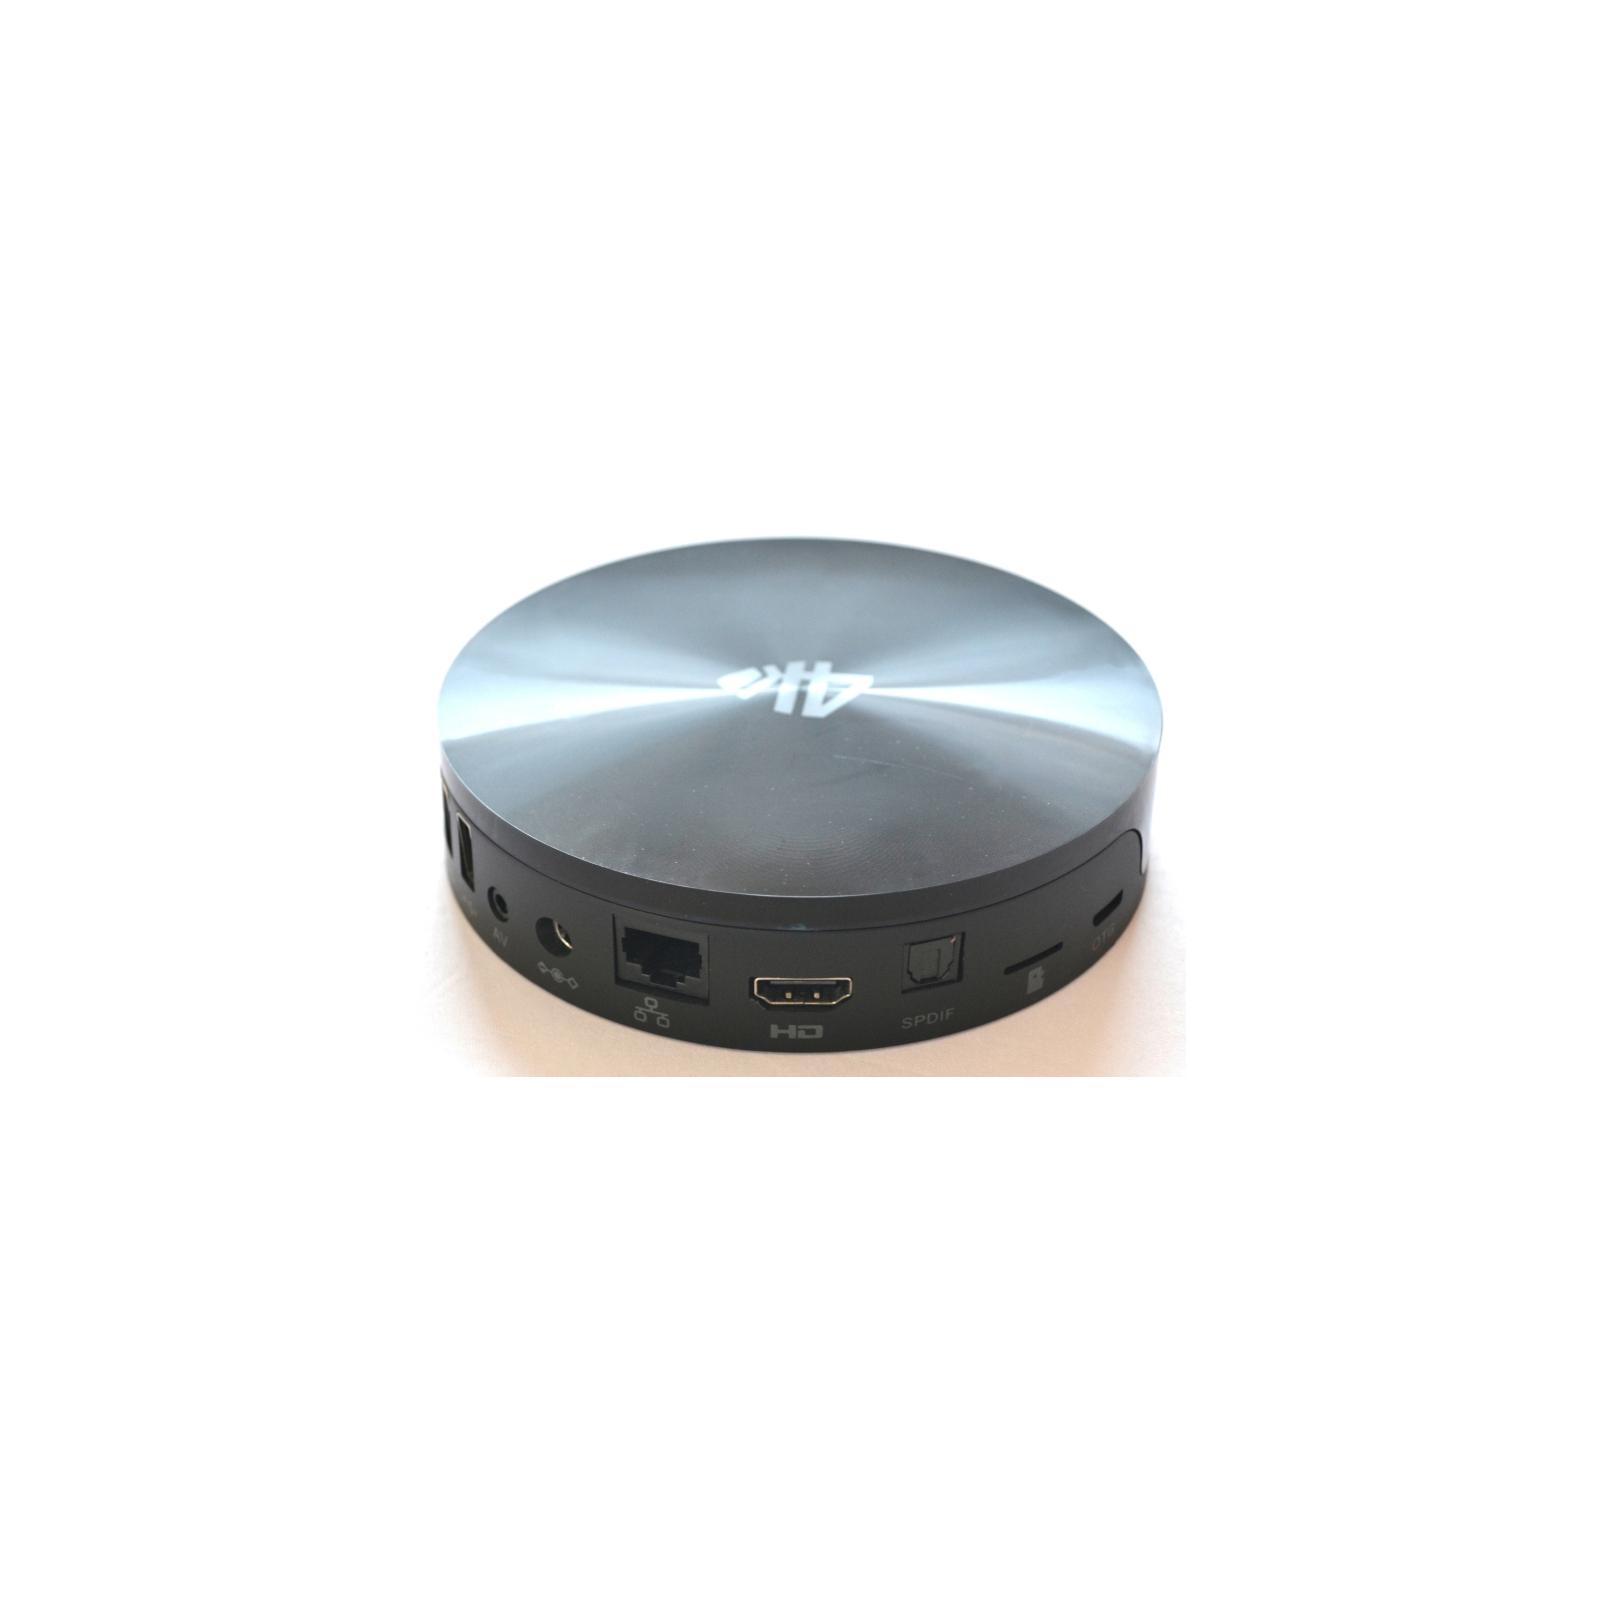 Медиаплеер Alfacore Smart TV Round изображение 5